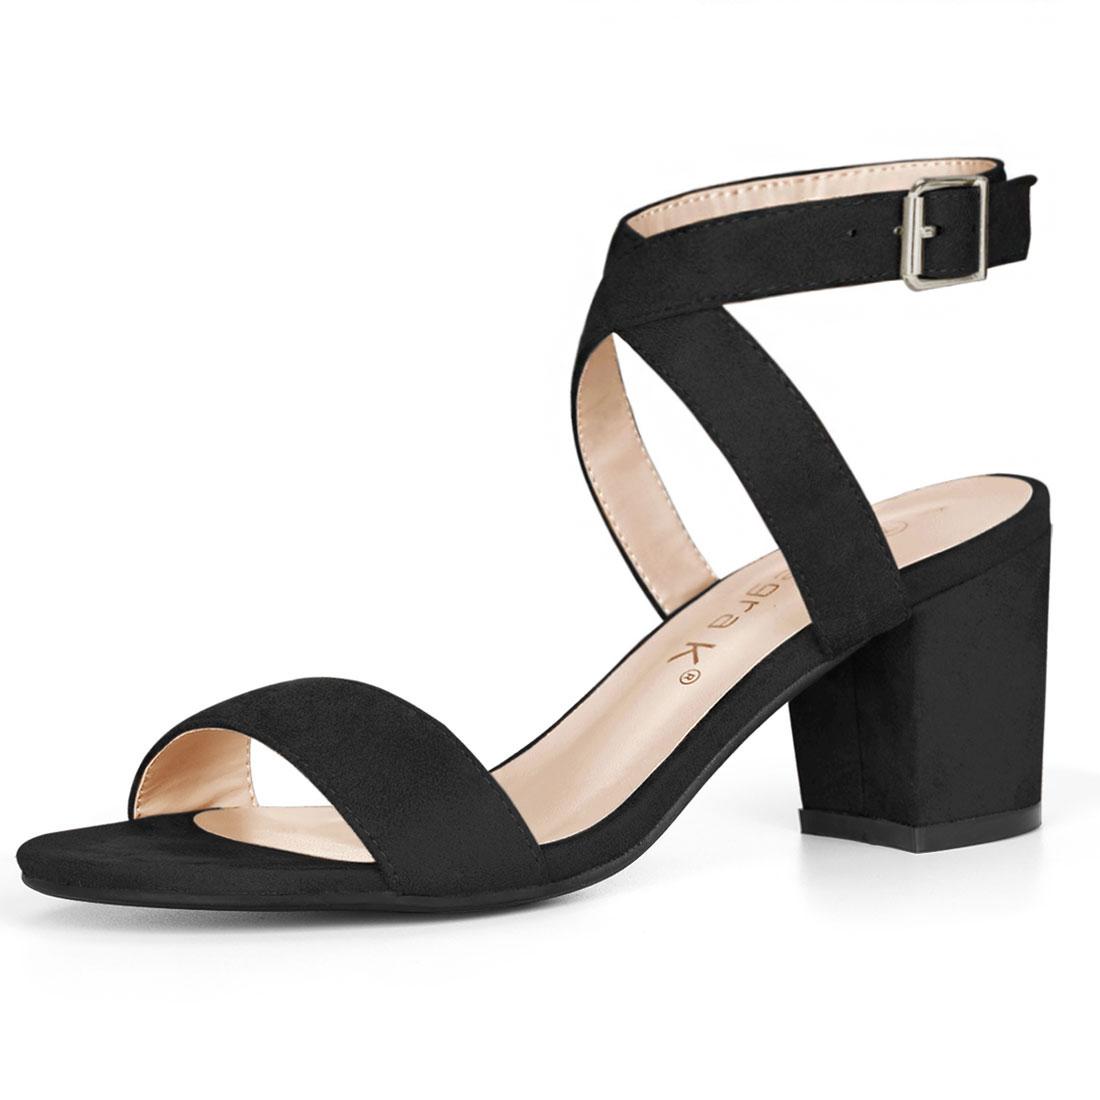 Allegra K Women's Crisscross Mid Block Heel Ankle Strap Sandals Black US 10